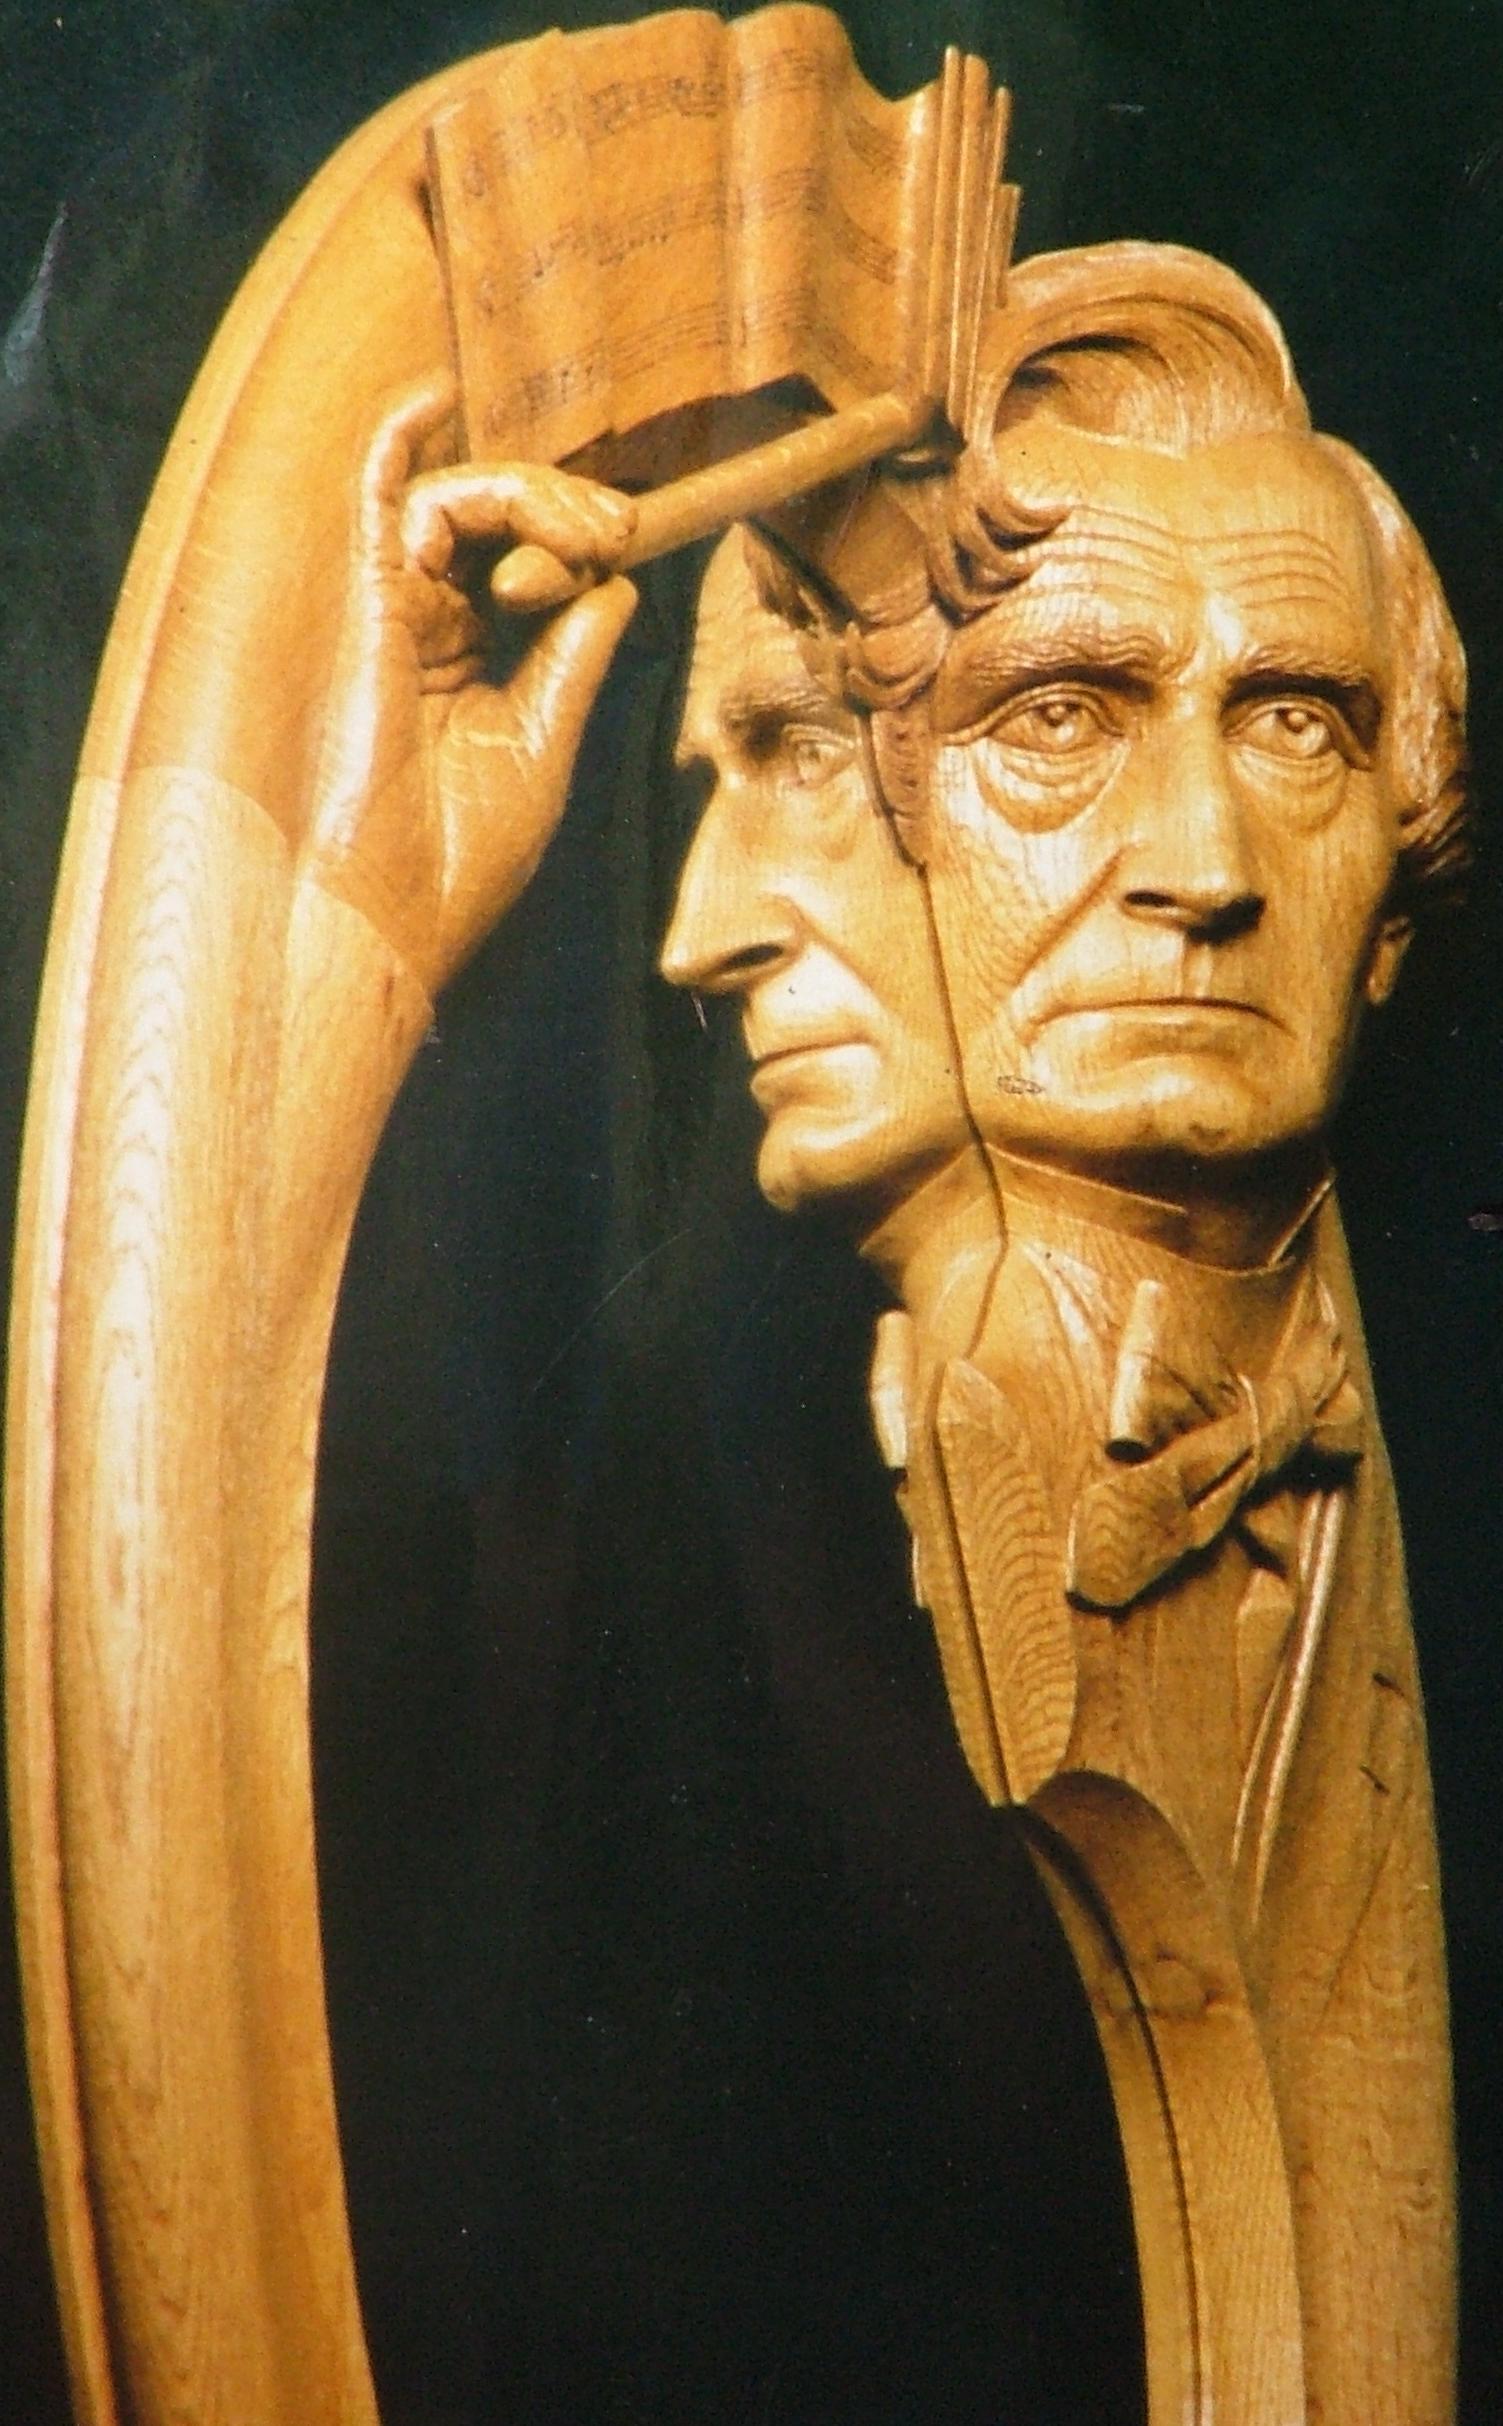 Accueil Scuplture Berlioz n°5 Philippe Gilbert